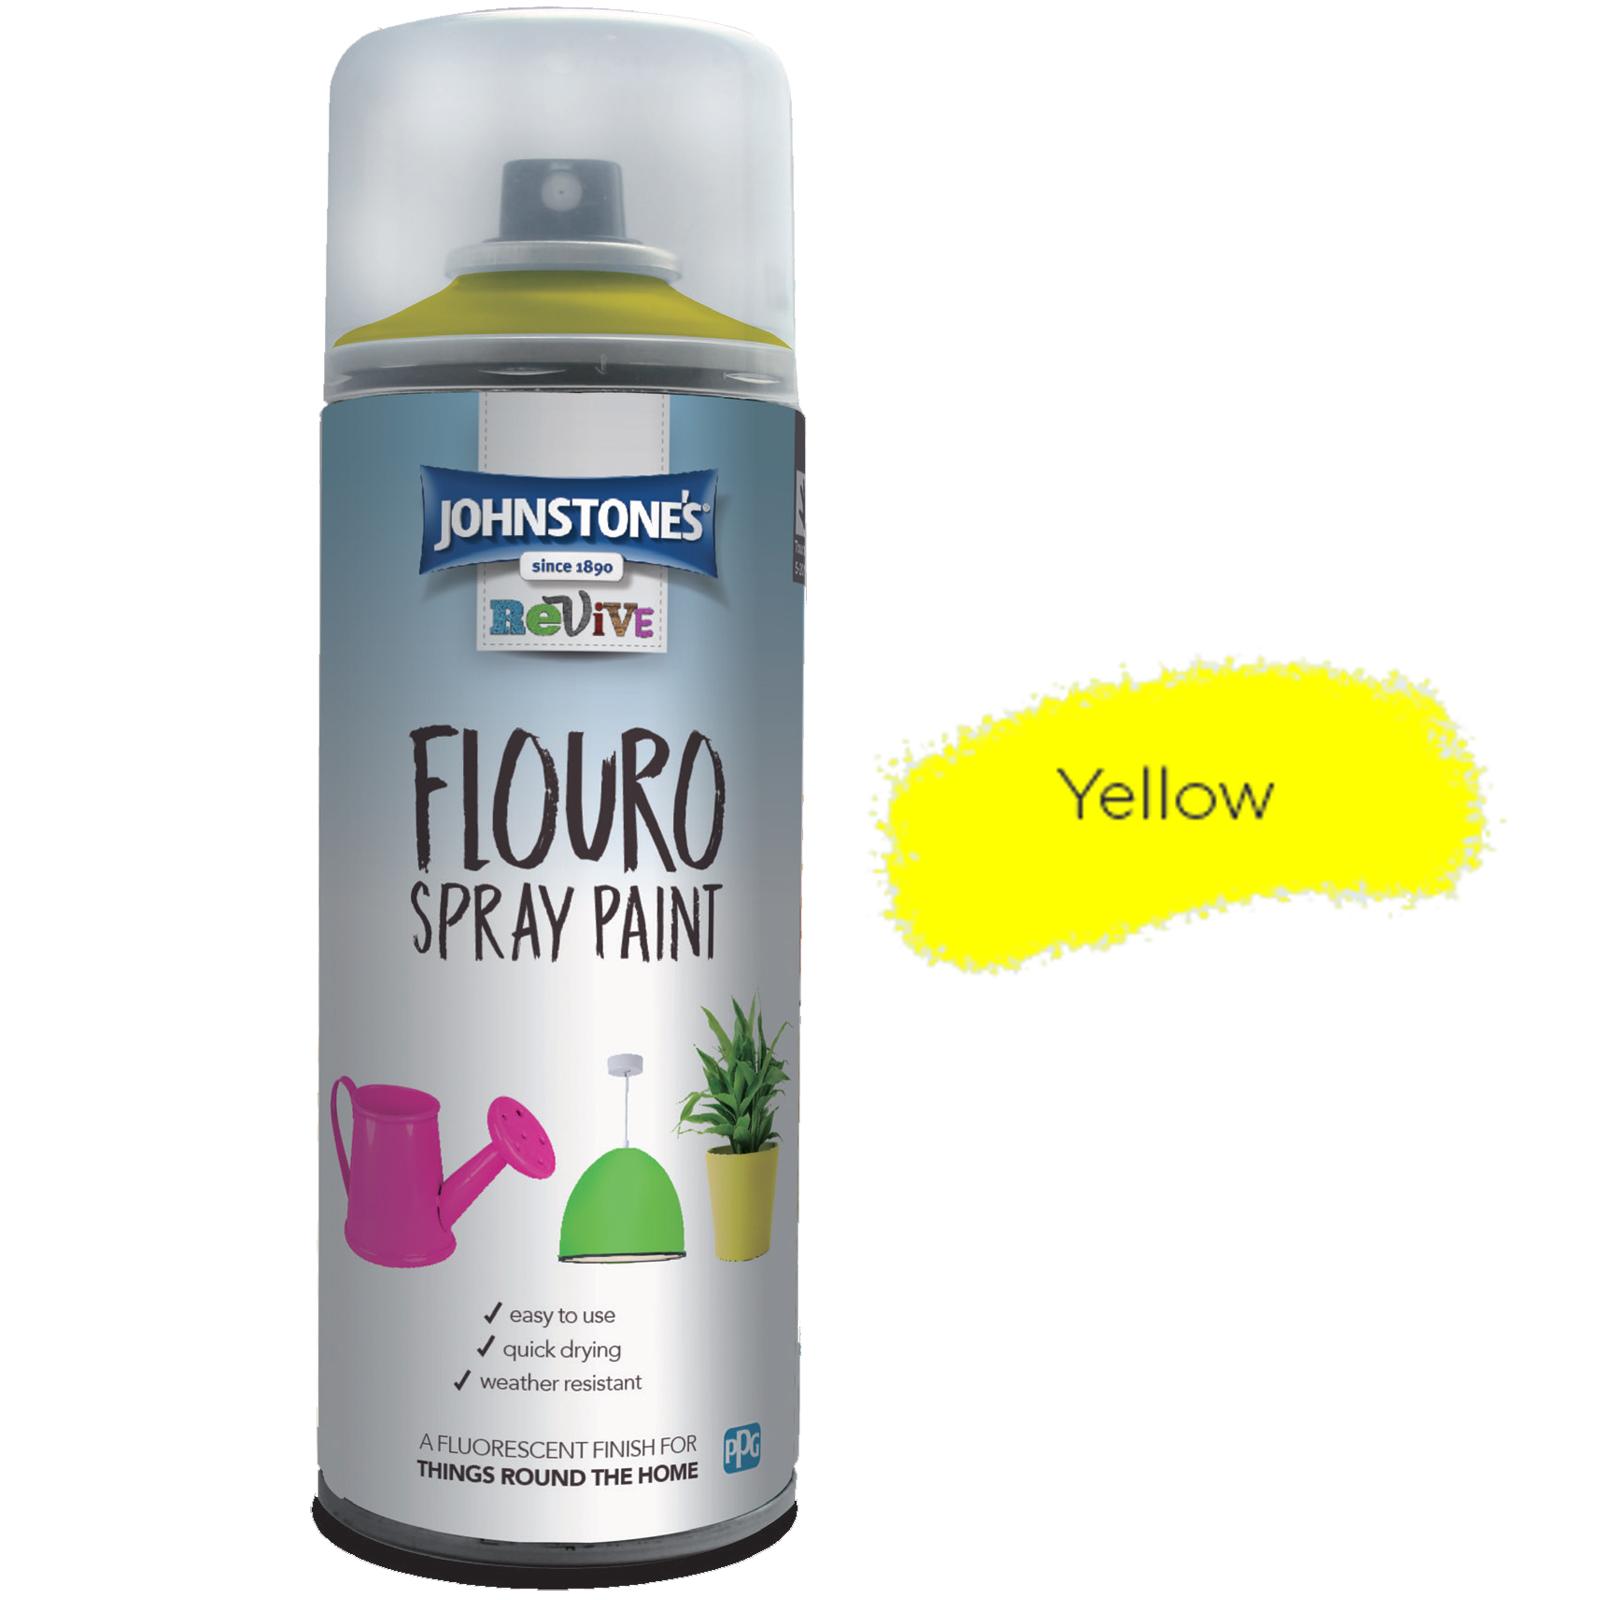 FLOURO SPRAY PAINT YELLOW